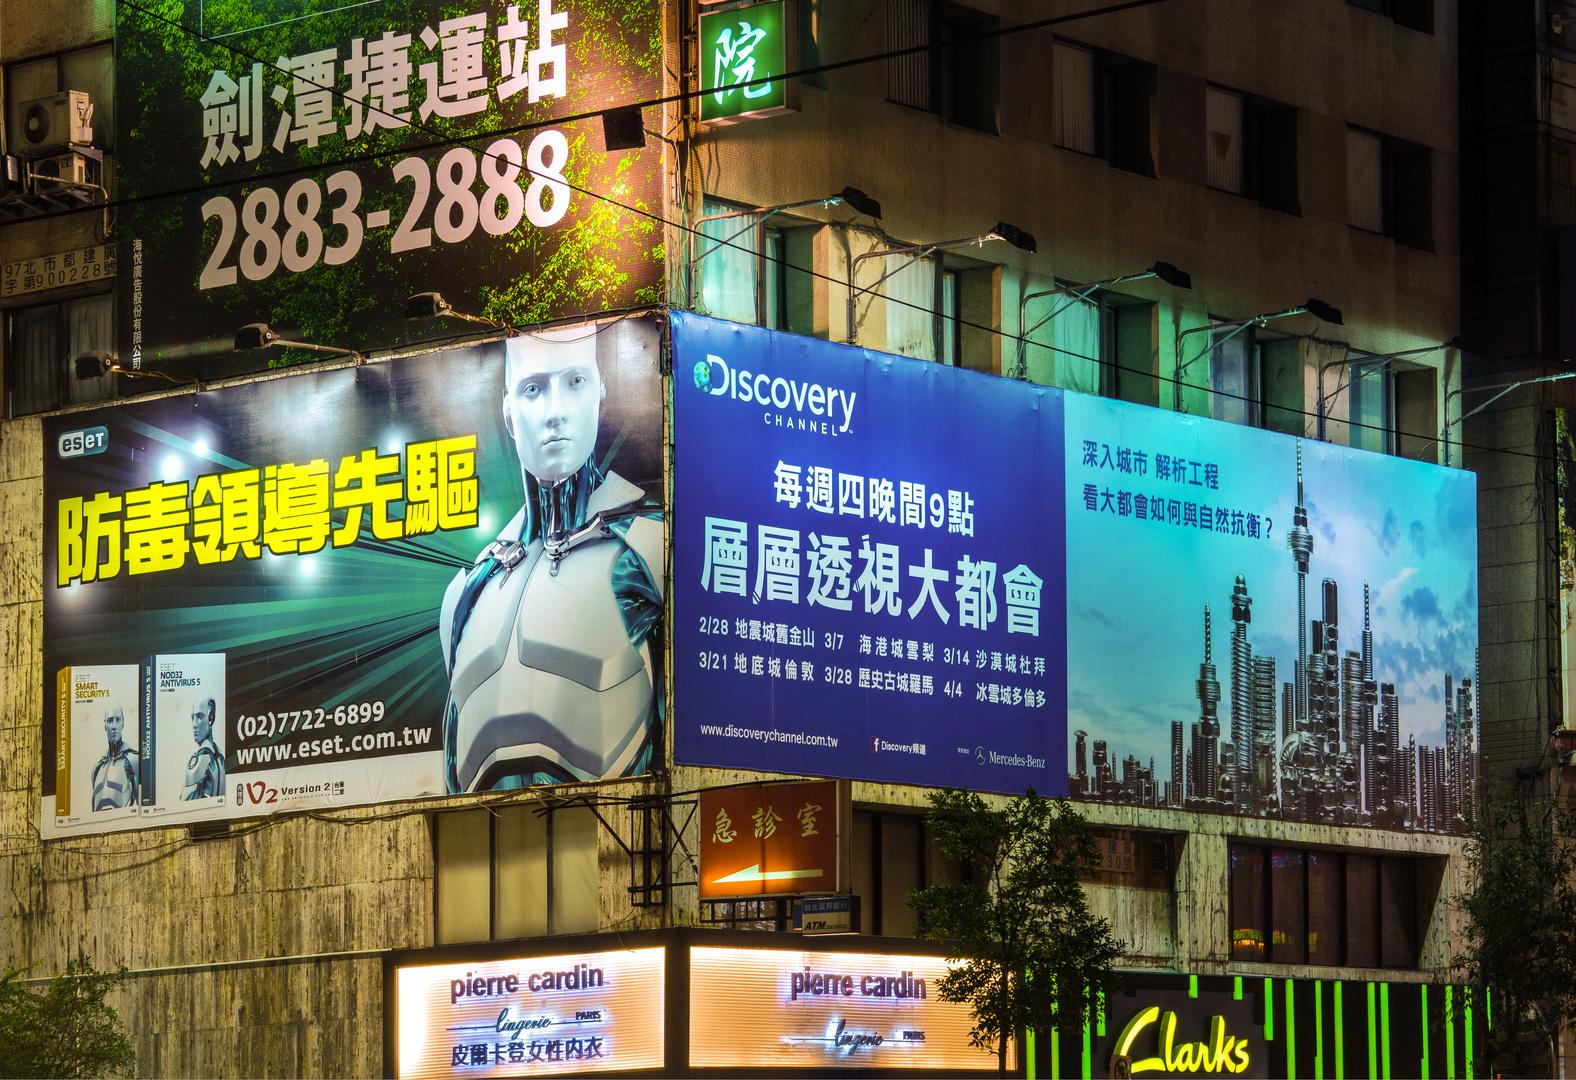 Discover Clarks Version 2 883-2888.com.tw - Werbung in Taipei